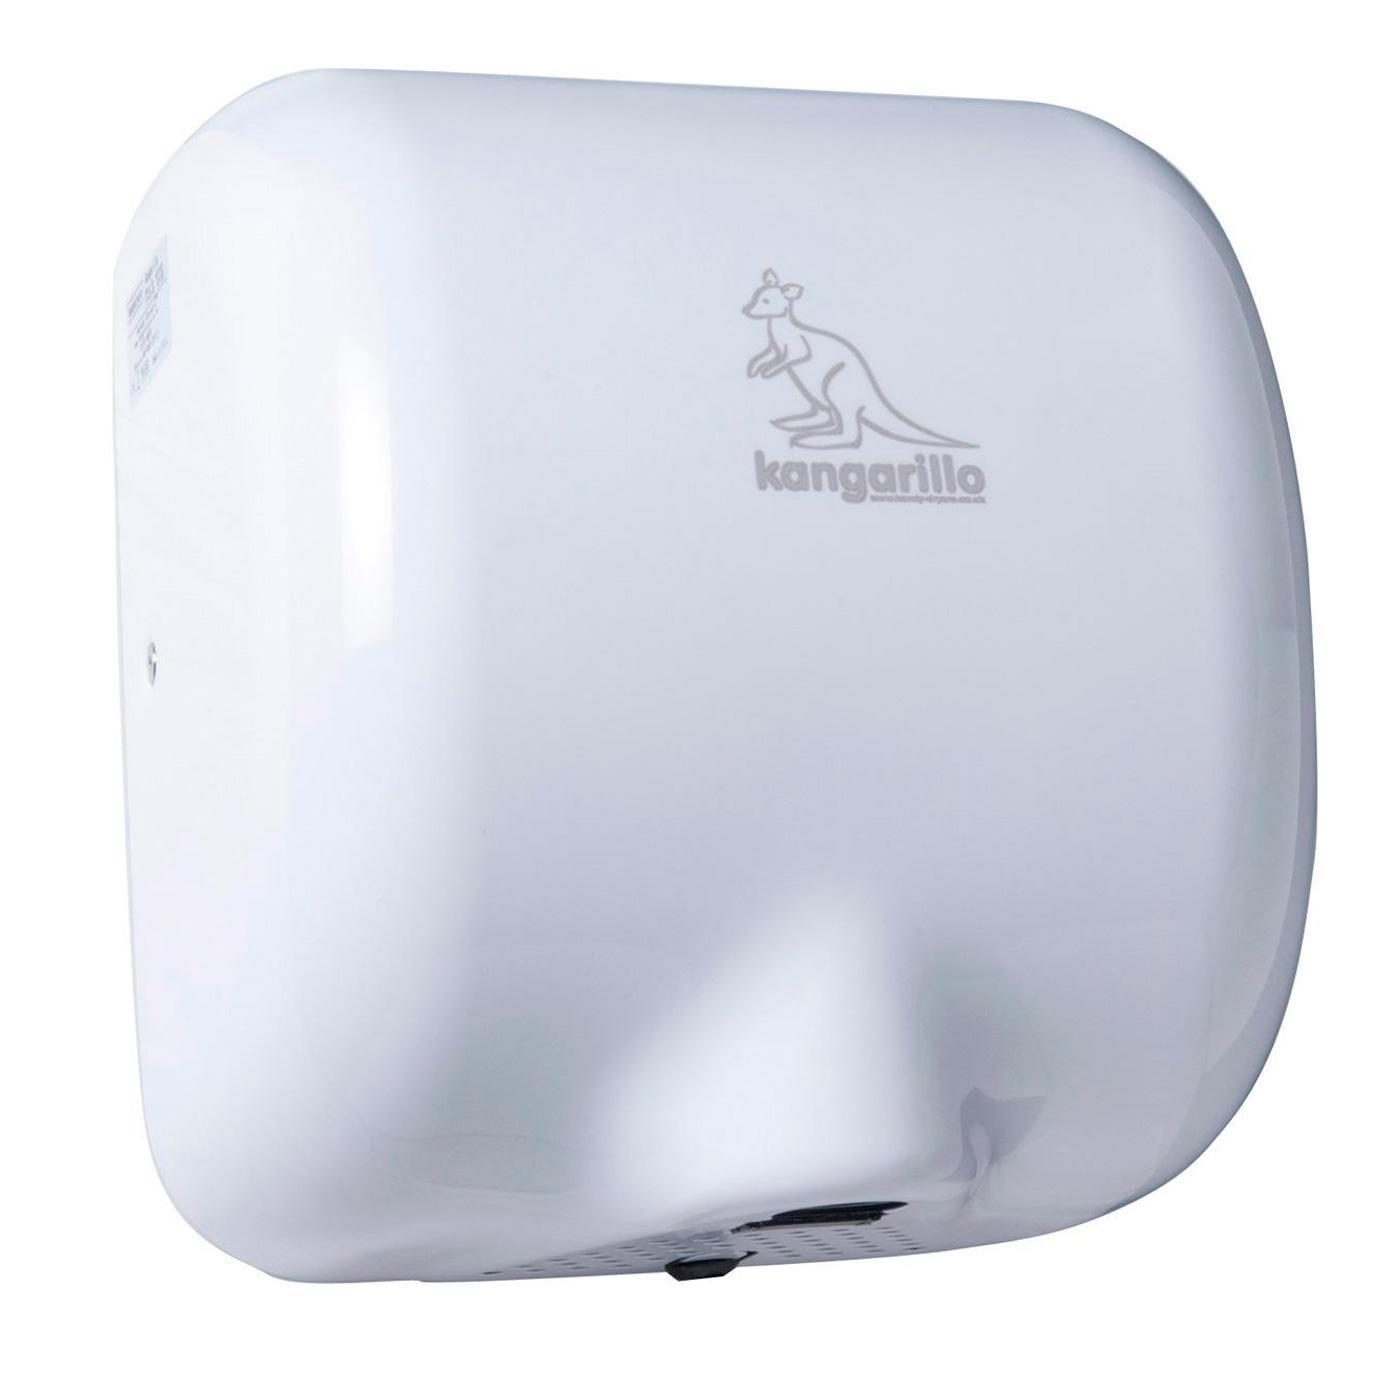 Kangarillo Hand Dryer Stainless Steel White Black